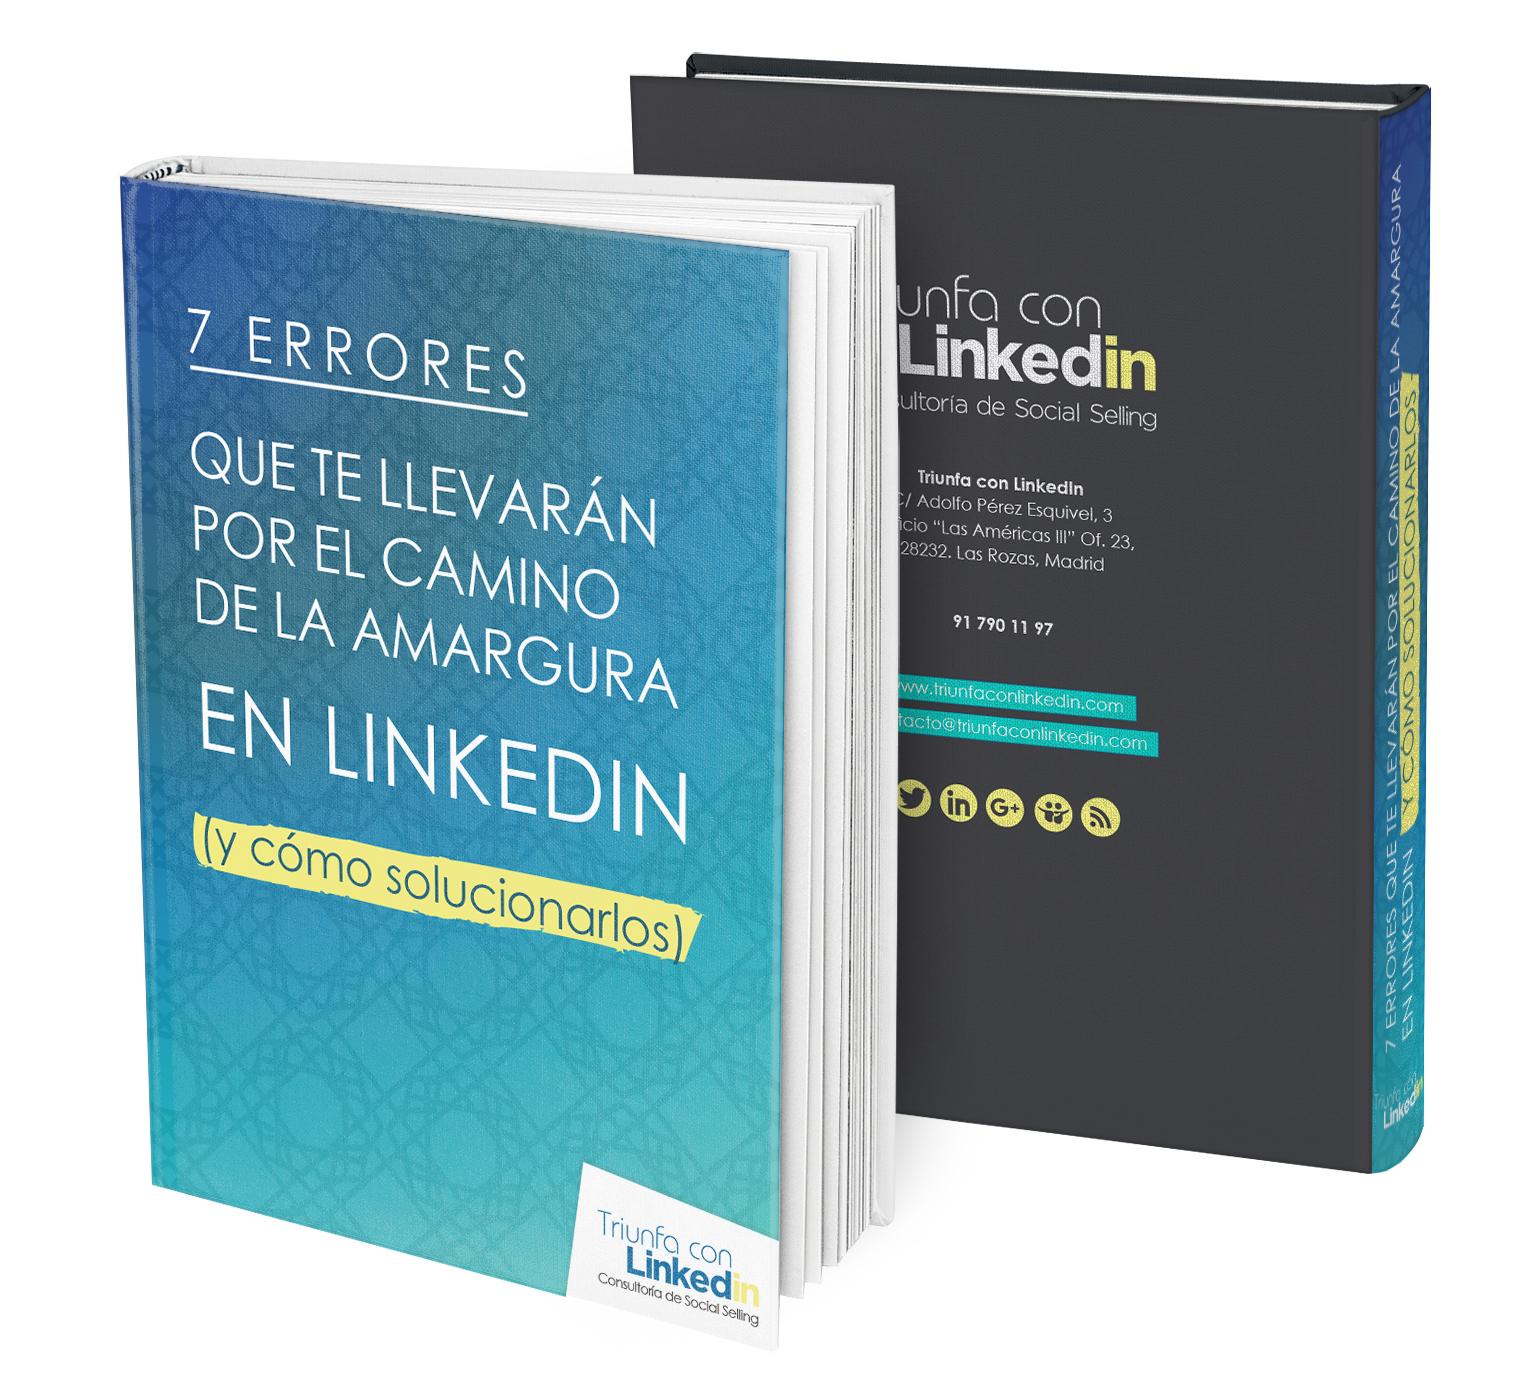 10 consejos para un perfil linkedin de alto impacto